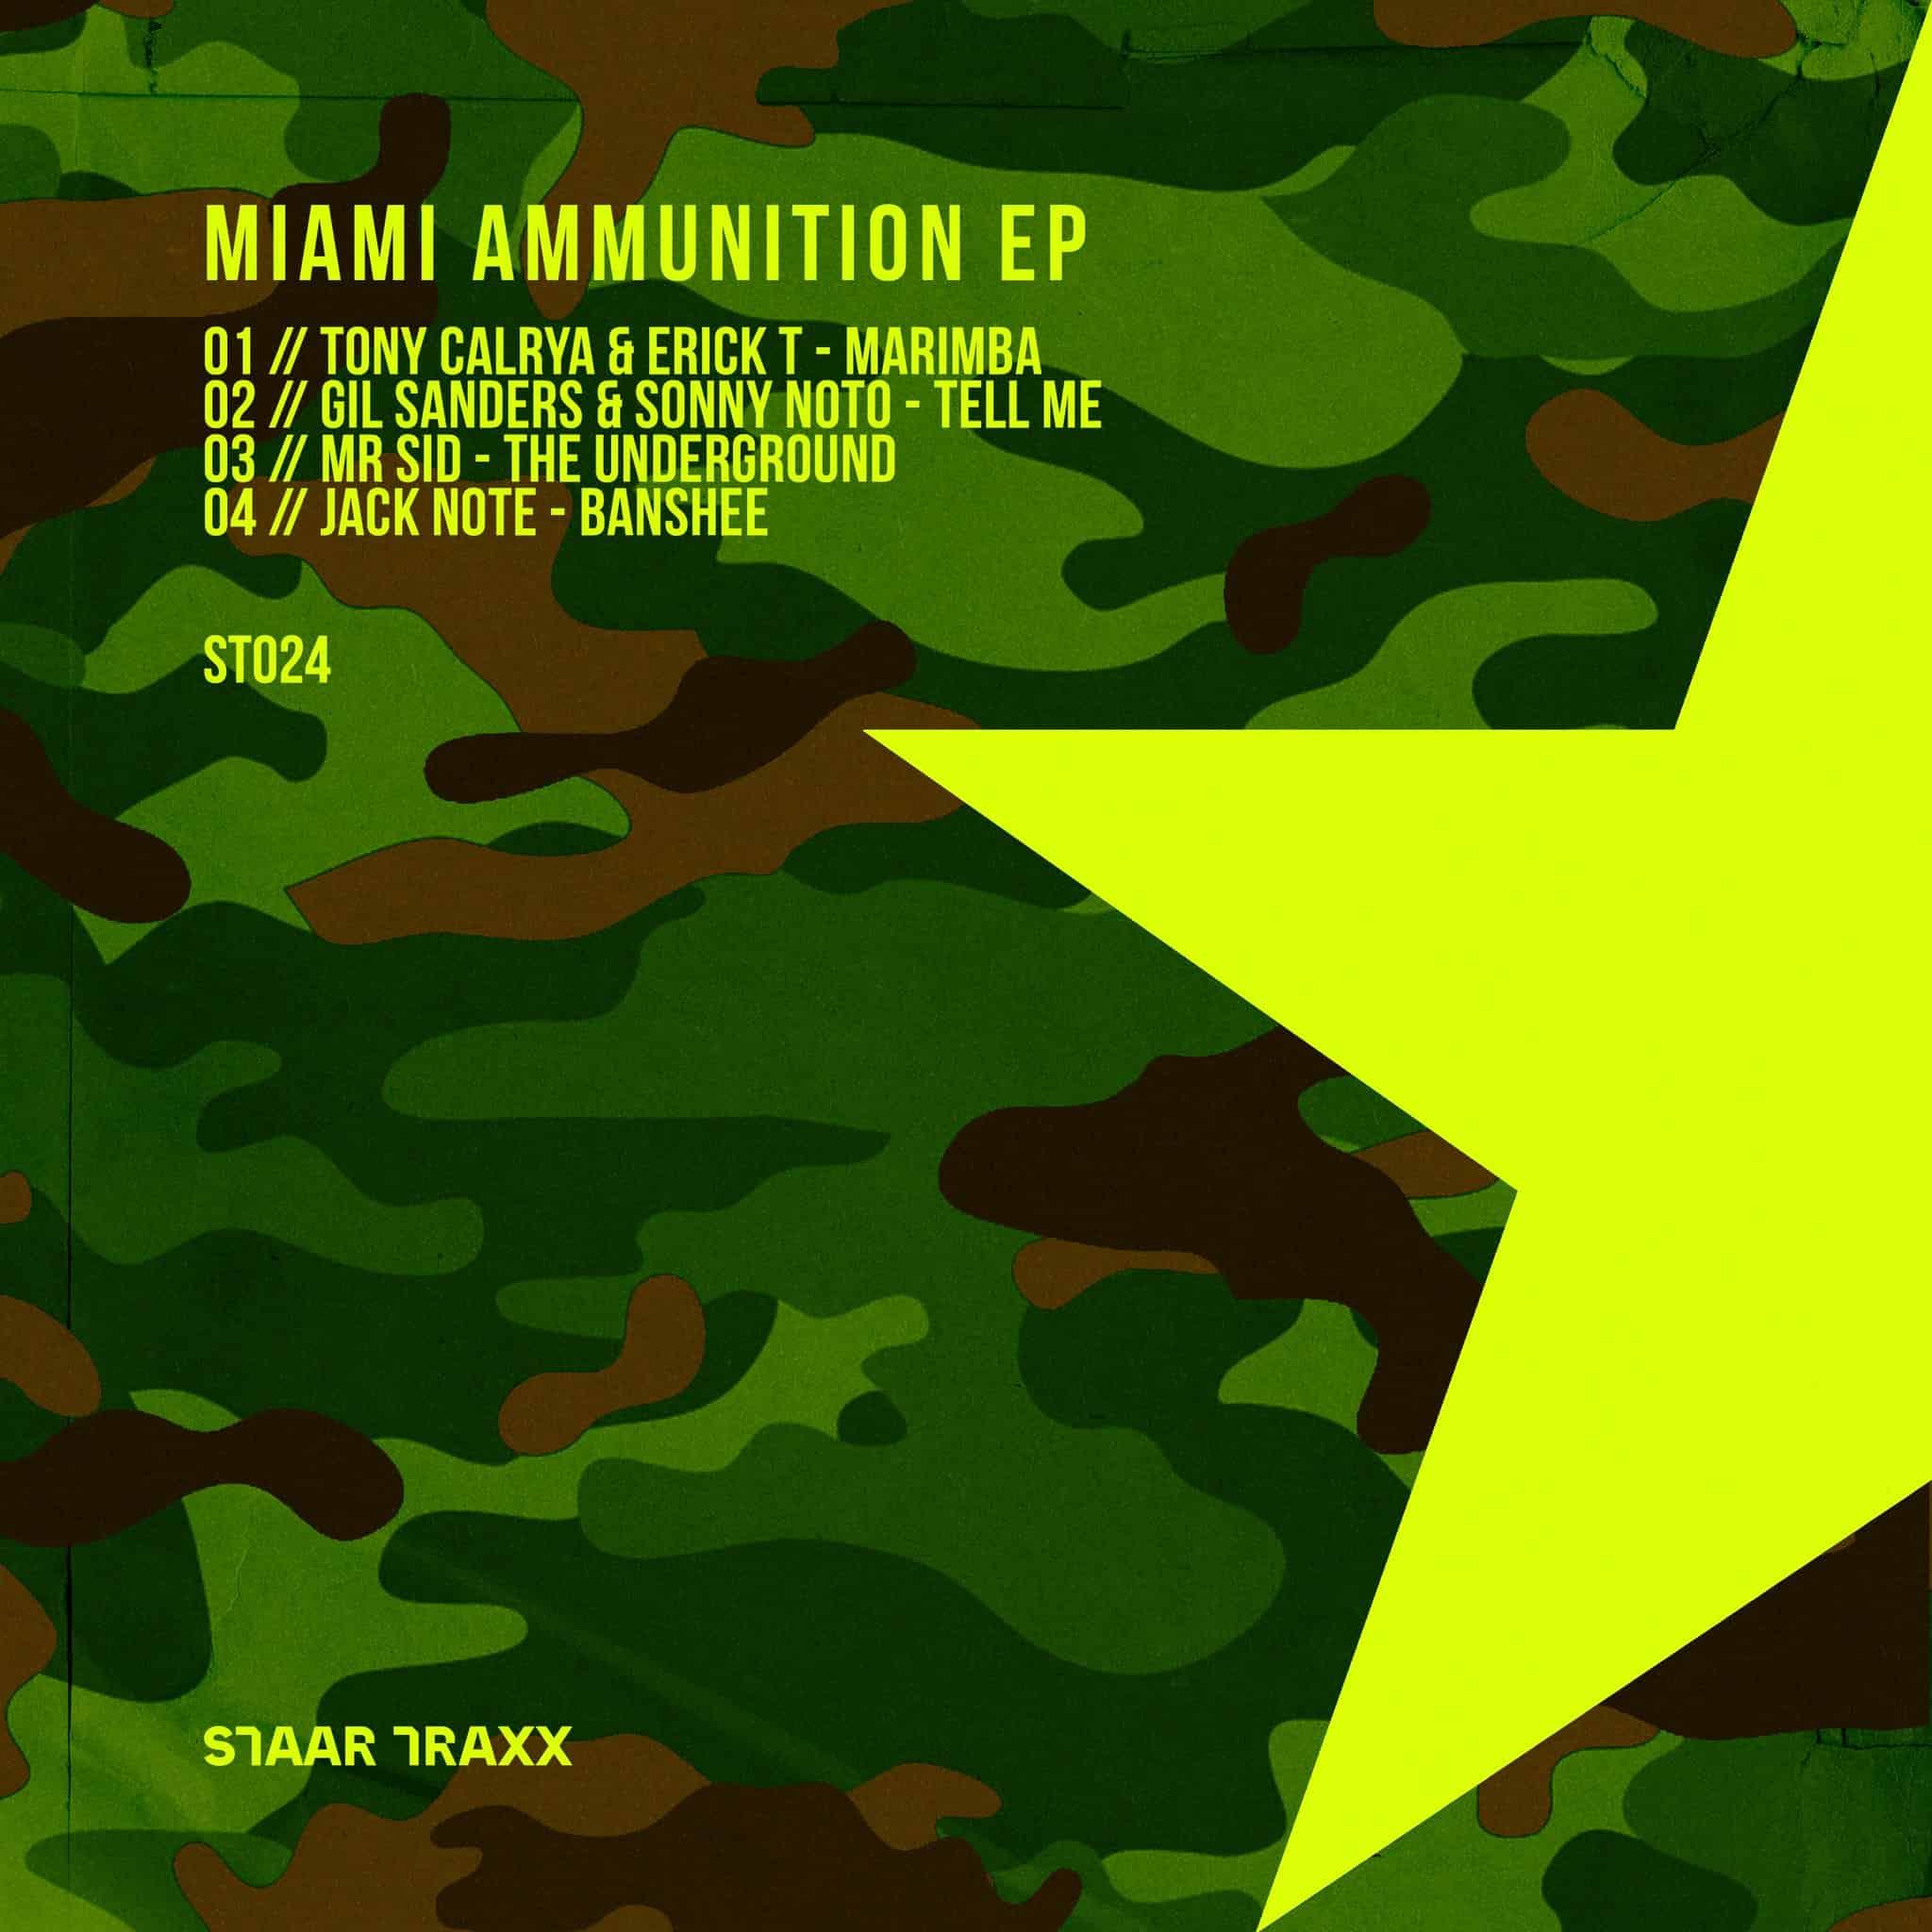 Miami Ammunition EP